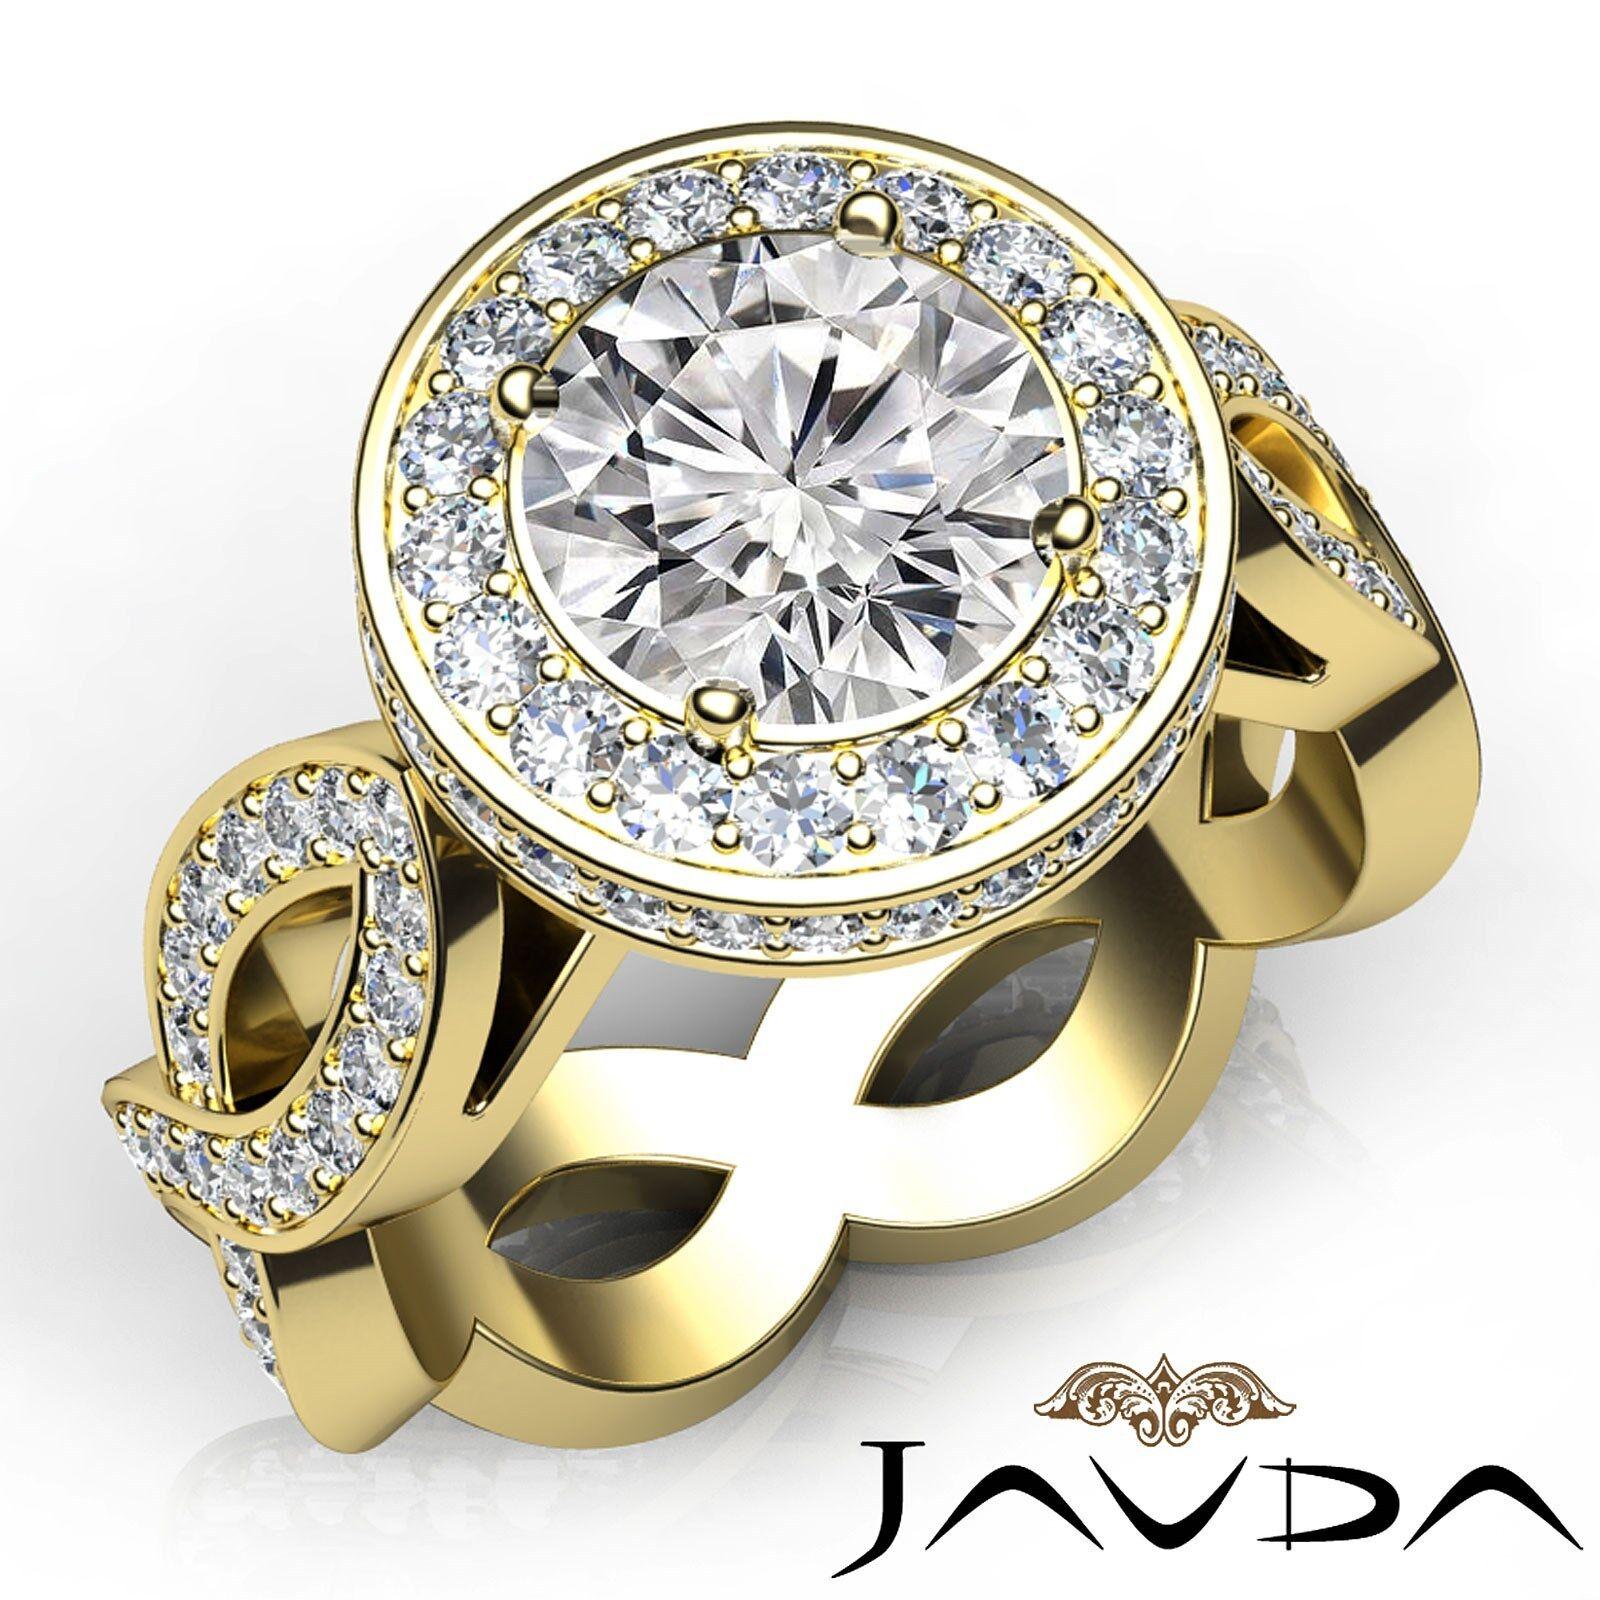 Filigree Design Cross Shank Halo Round Diamond Engagement Ring GIA F VS2 2.8 Ct